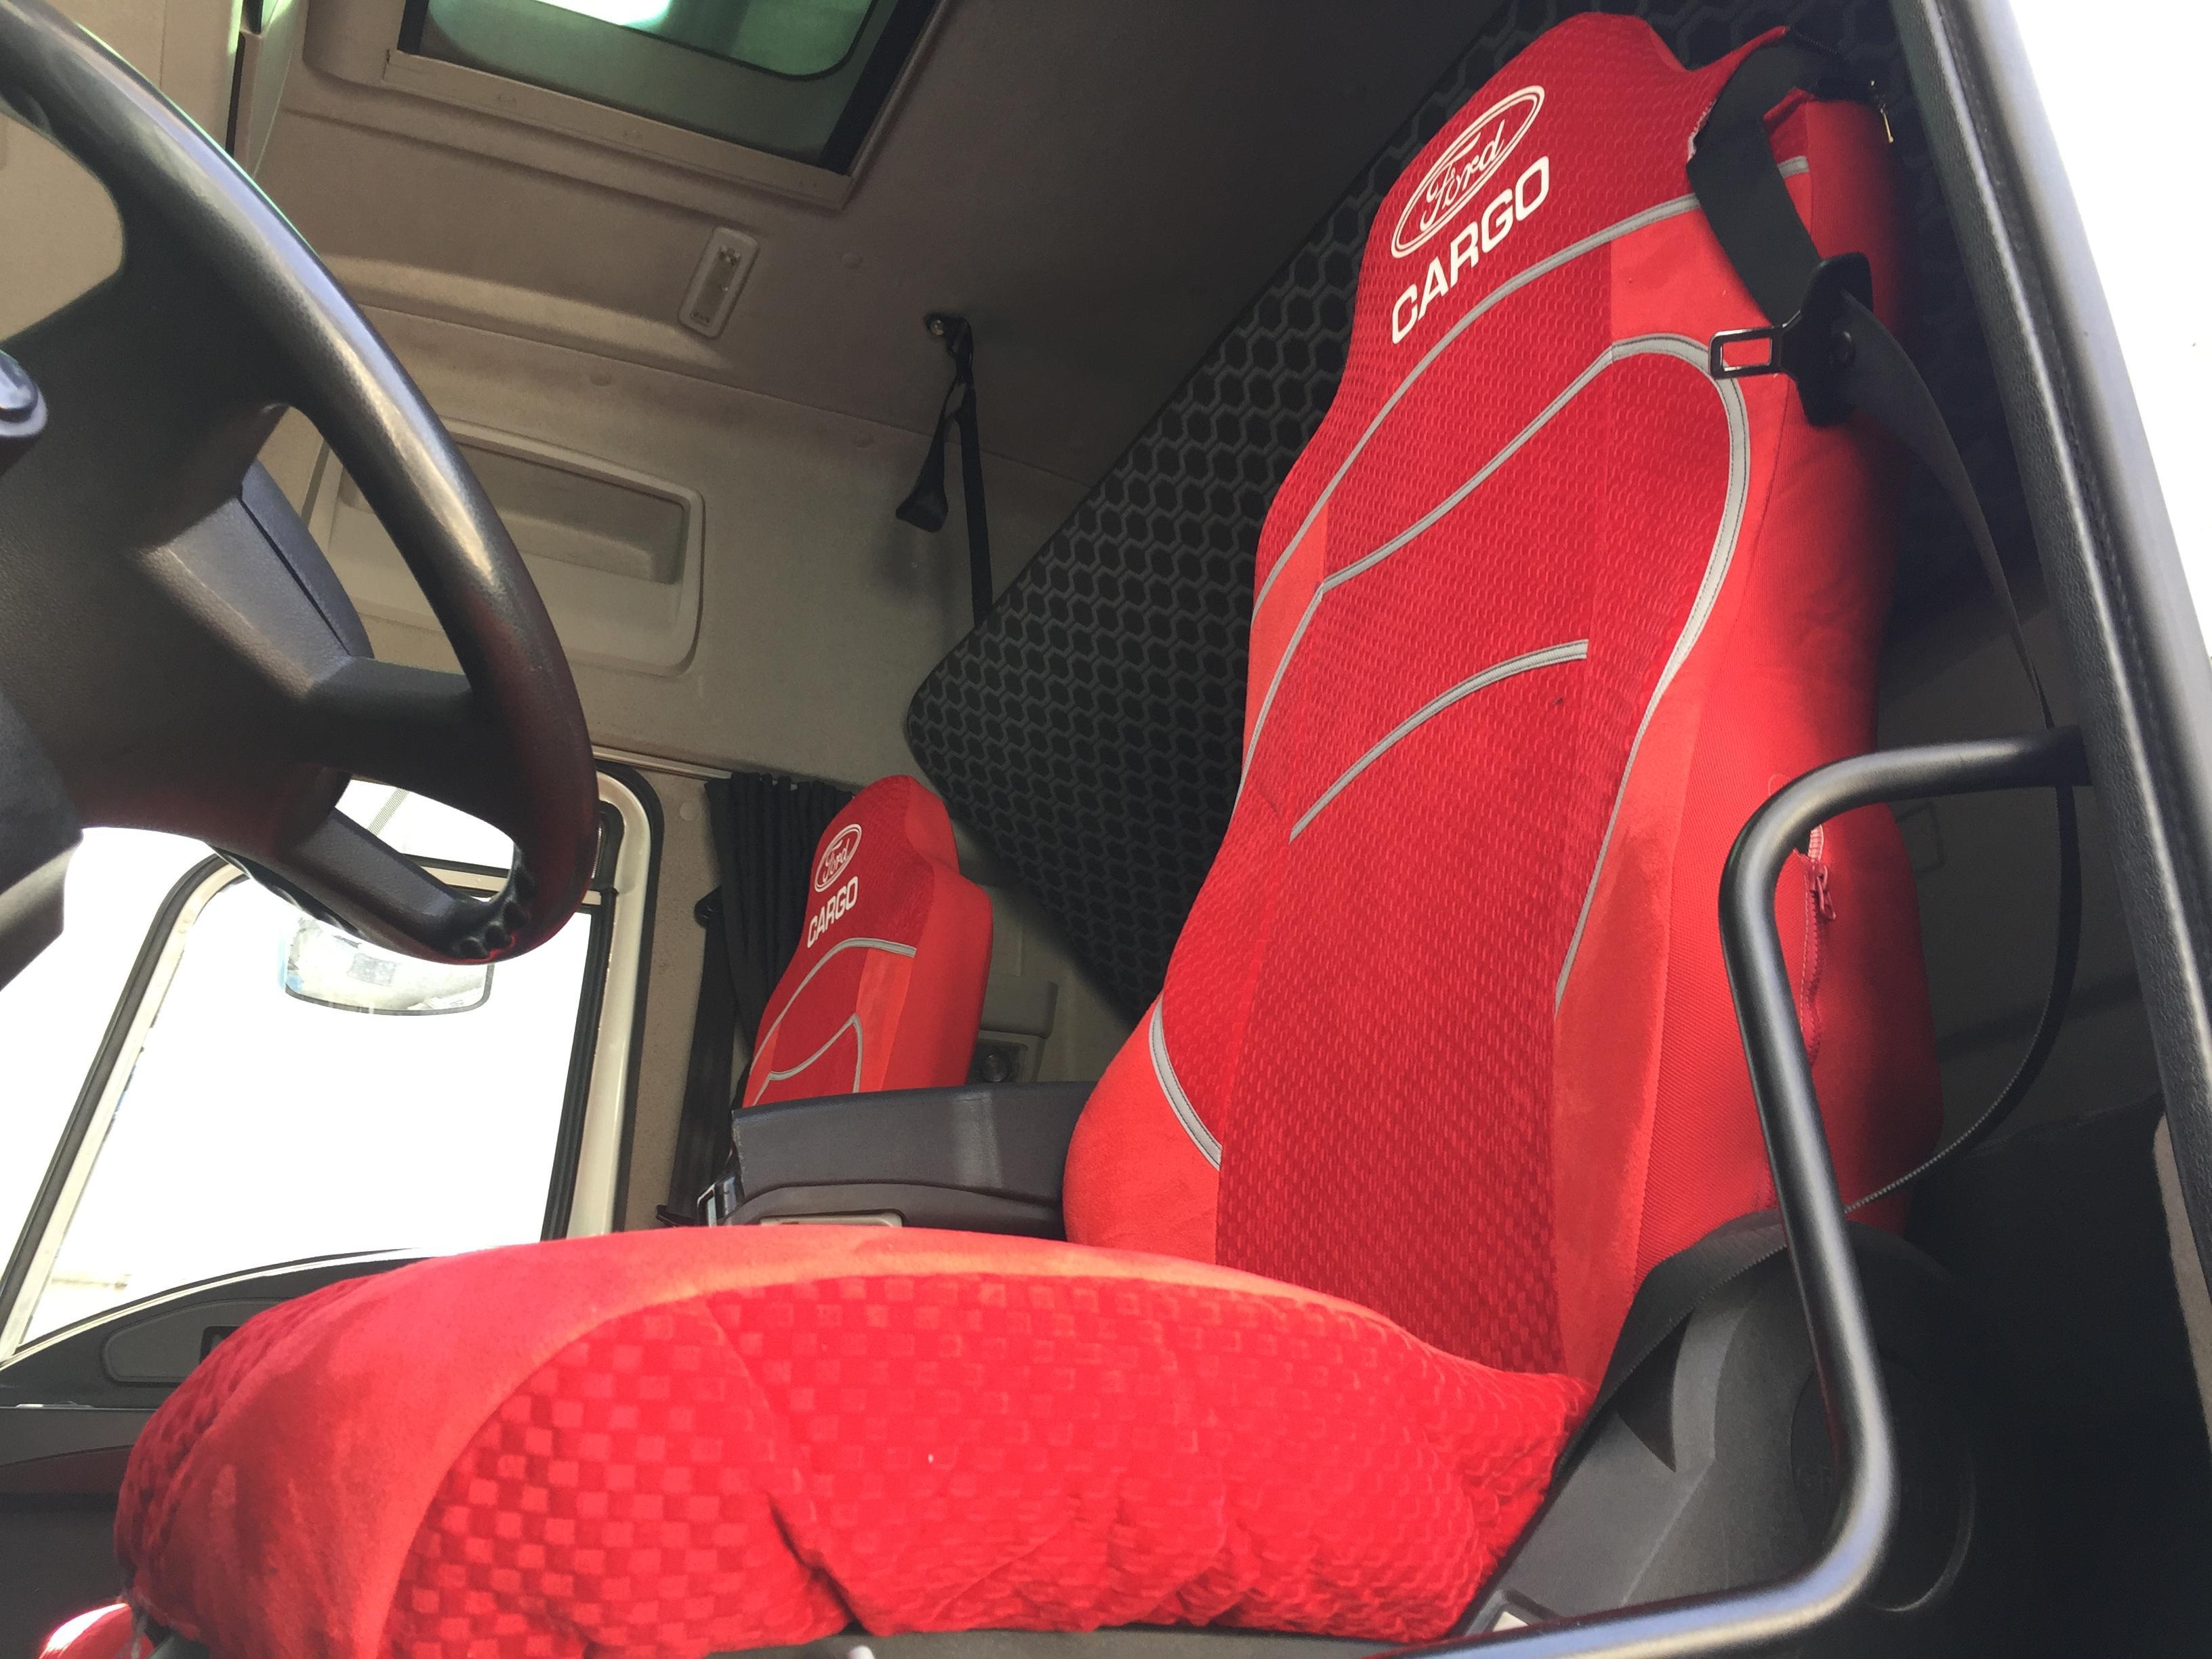 Ford cargo kırmızı kılıf